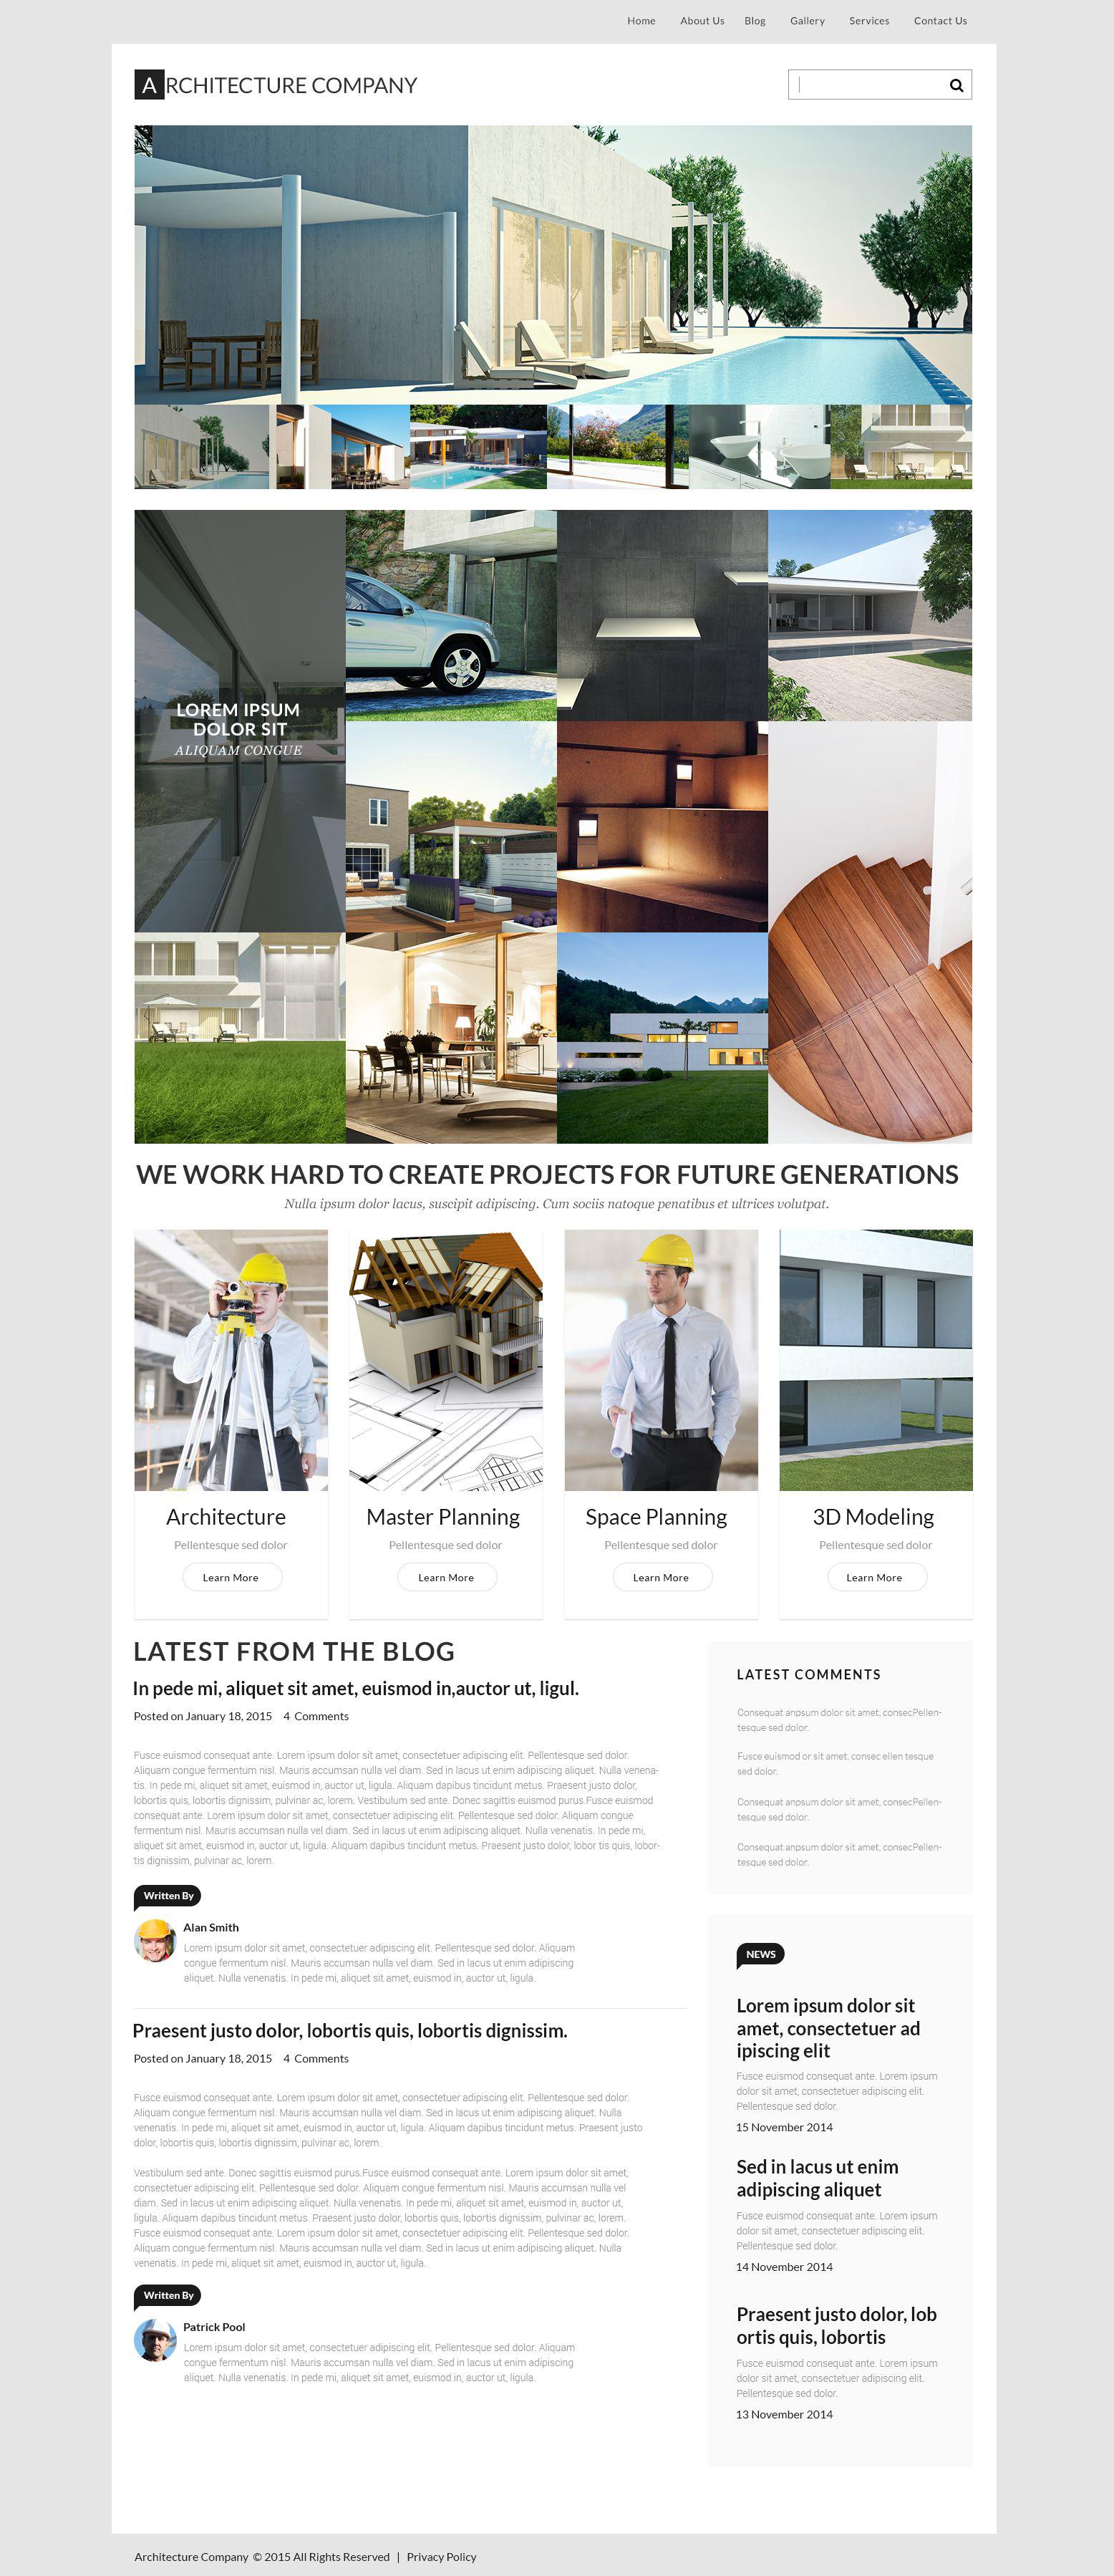 Architect's Bureau WordPress Theme - screenshot